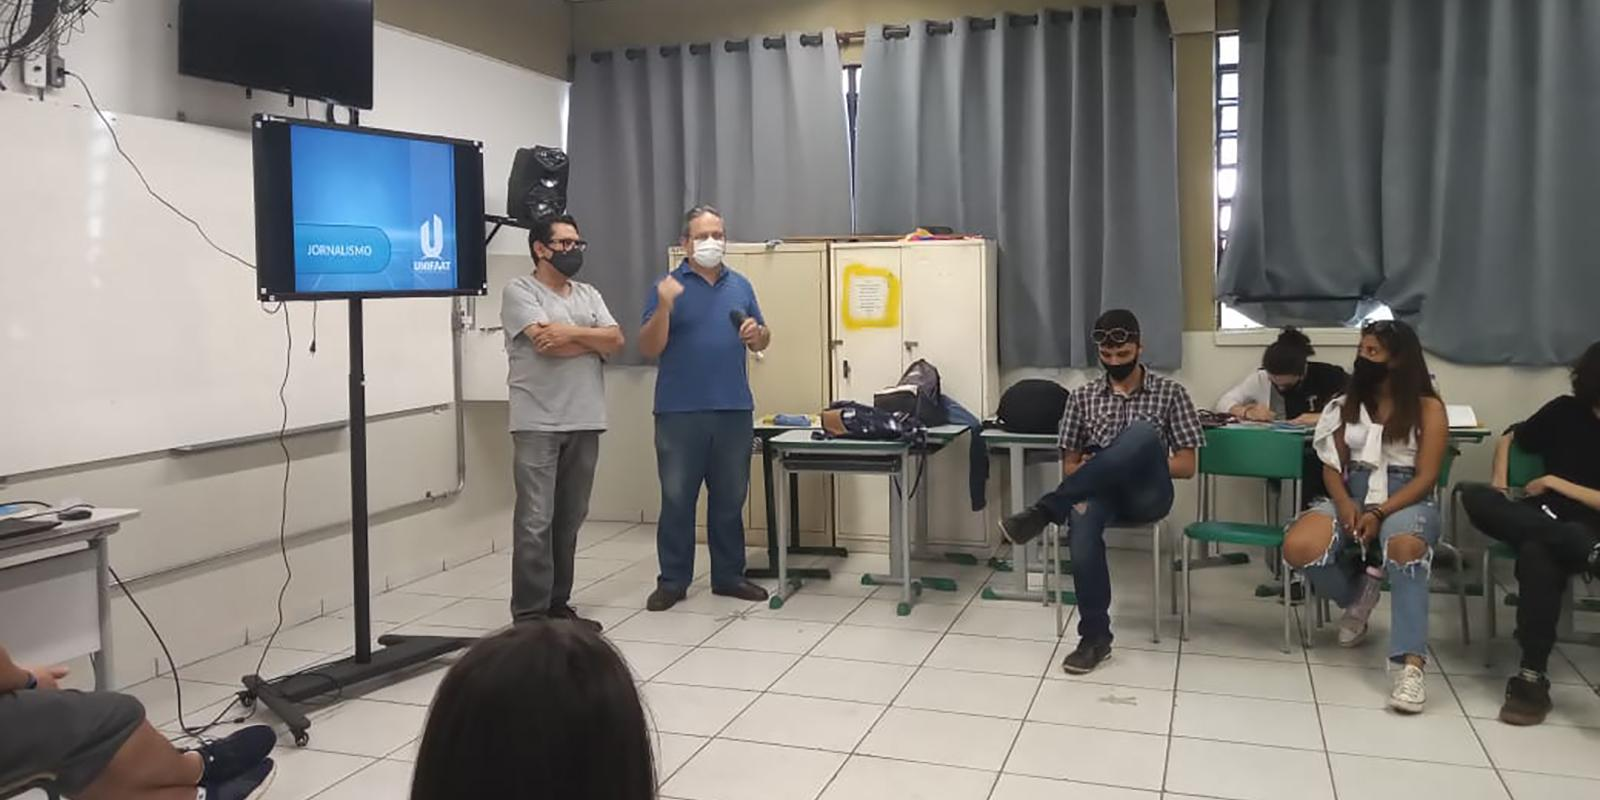 Curso de Jornalismo visita Escola Estadual Maria José Moraes Salles e fala sobre tecnologia